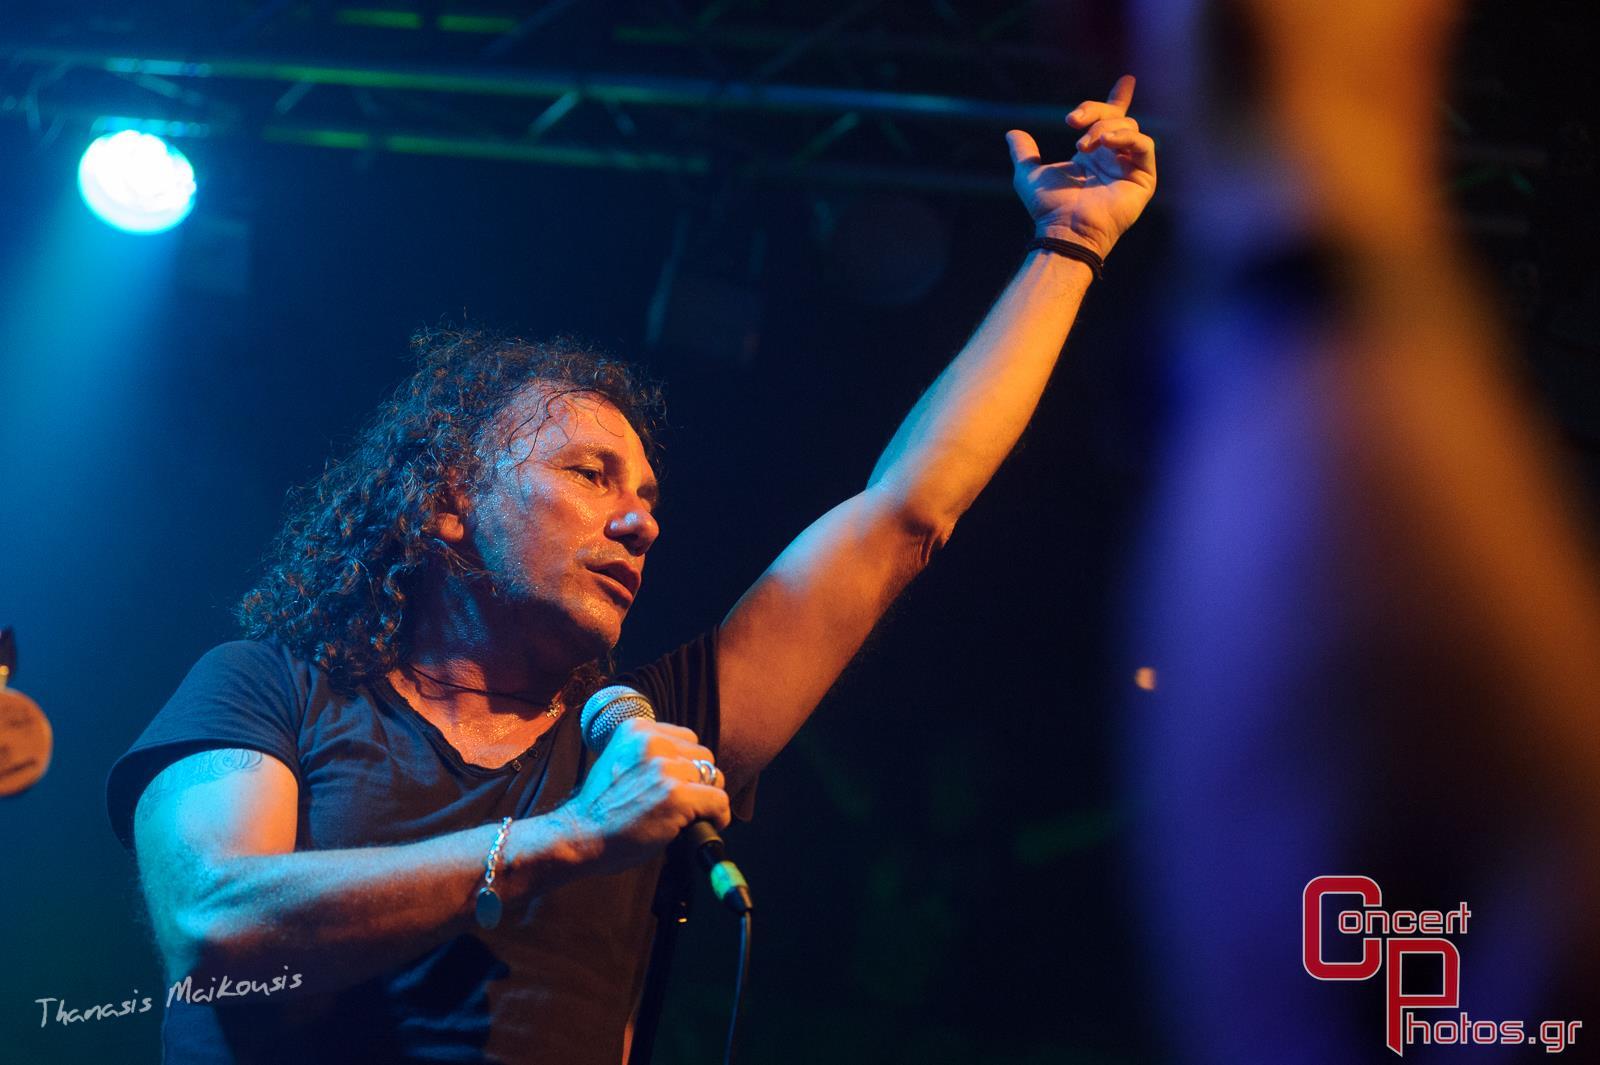 Paul Di Anno -Paul Di Anno  photographer:  - Thanasis_Maikousis (11 of 124)